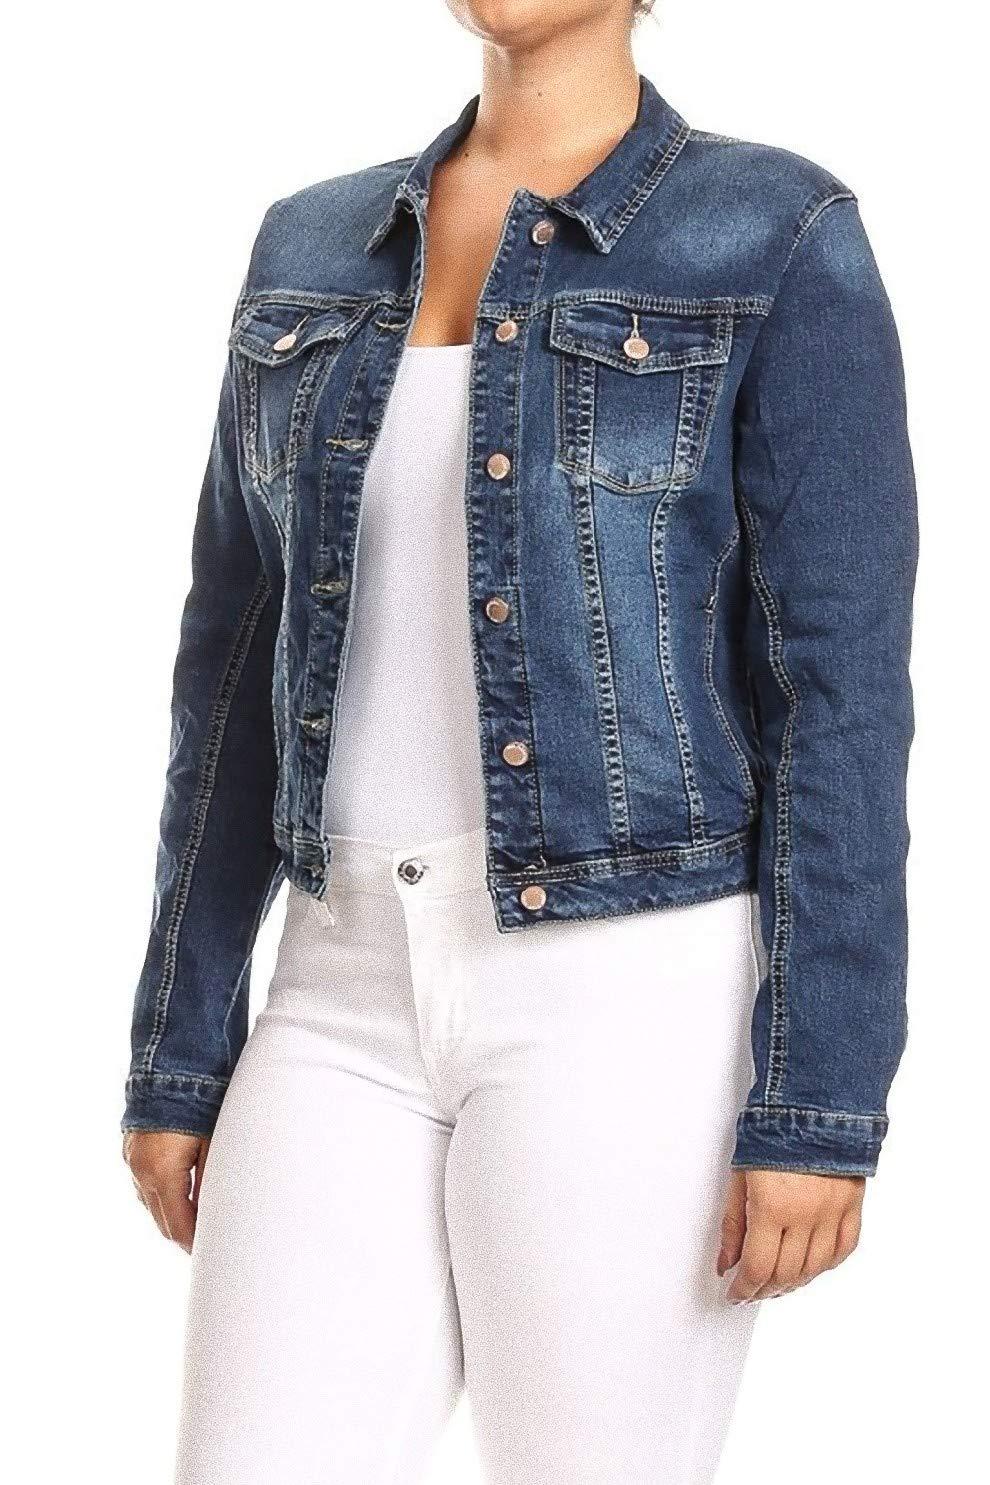 Women's Junior Plus Size, Premium Denim Jackets Long Sleeve Loose Jean Coats in M. Blue Size 2XL